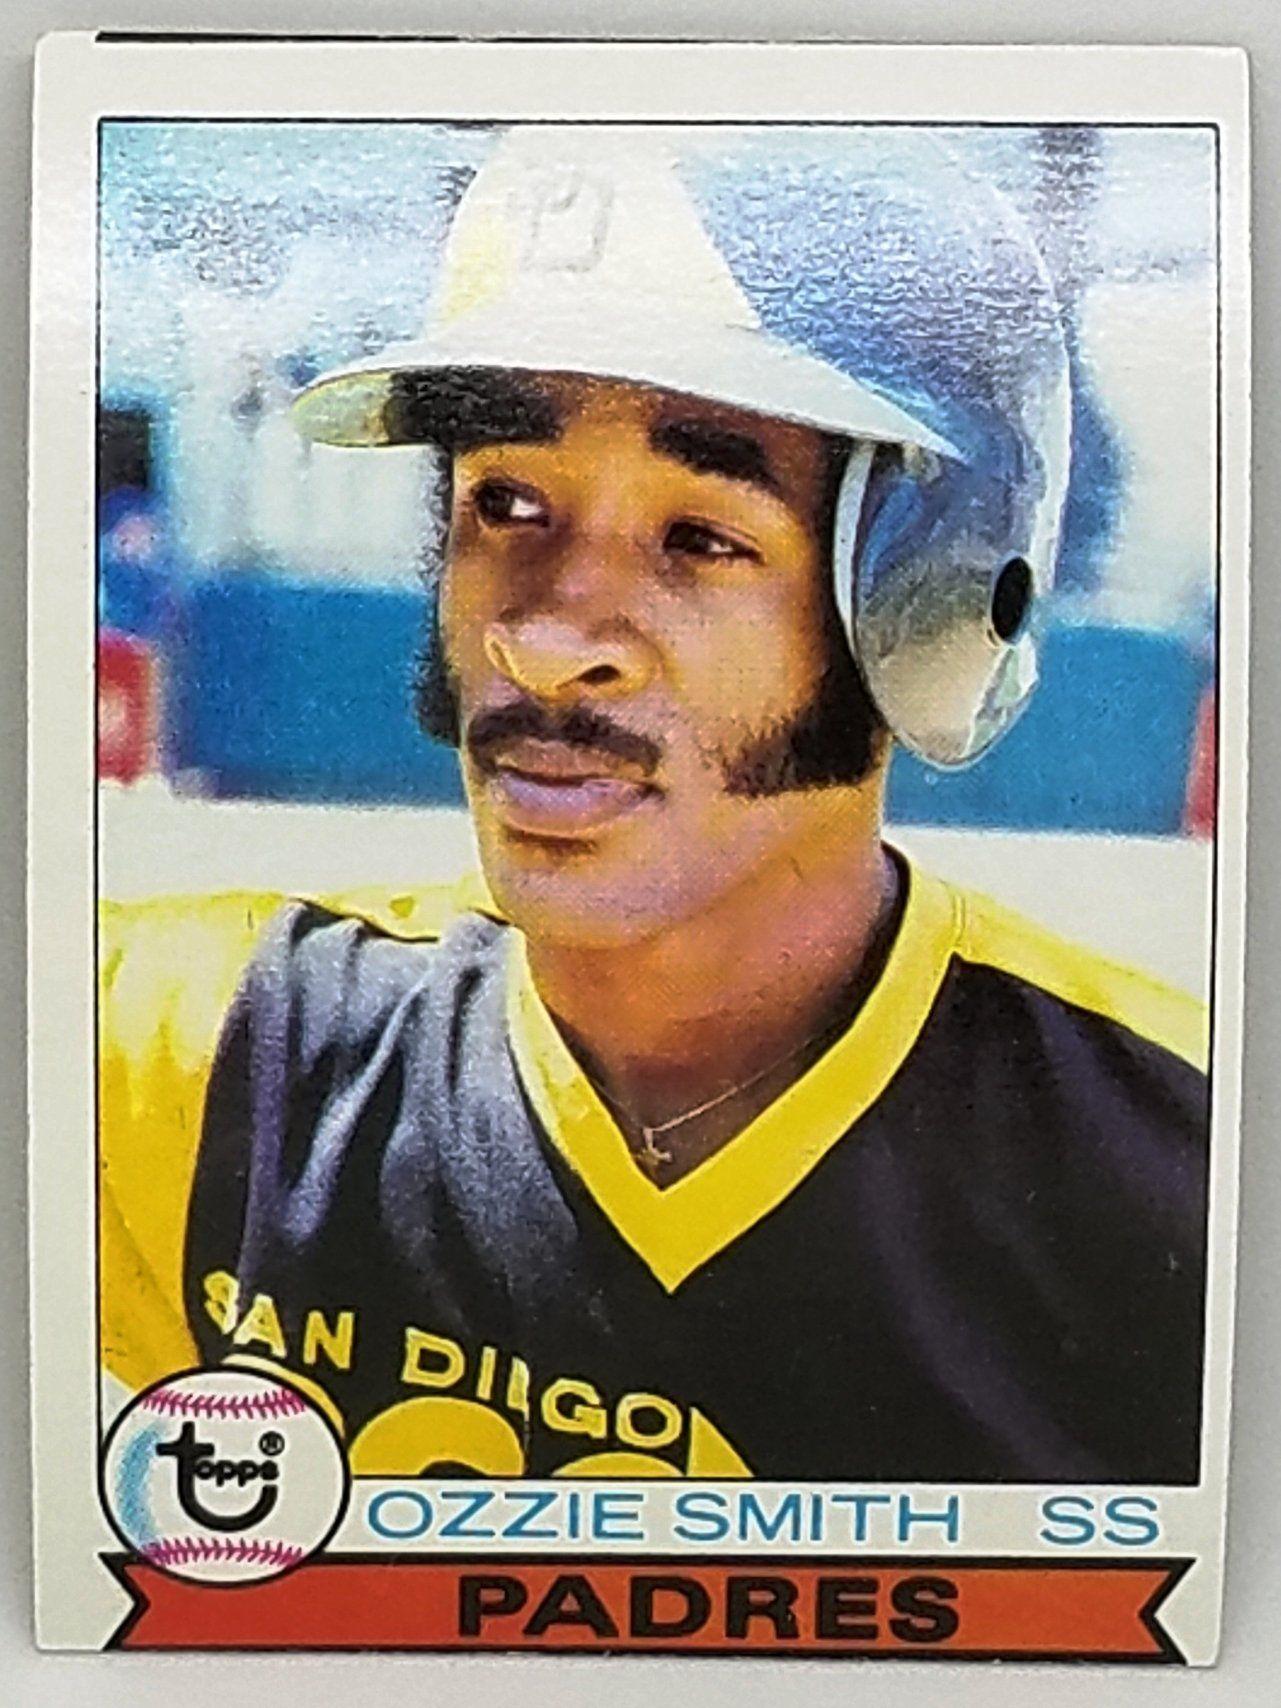 1979 Topps 116 Ozzie Smith Rookie Card Set Break Hof Wizard Oz Padres Shortstop 100 Original Baseball Card Values Baseball Cards Baseball Cards For Sale